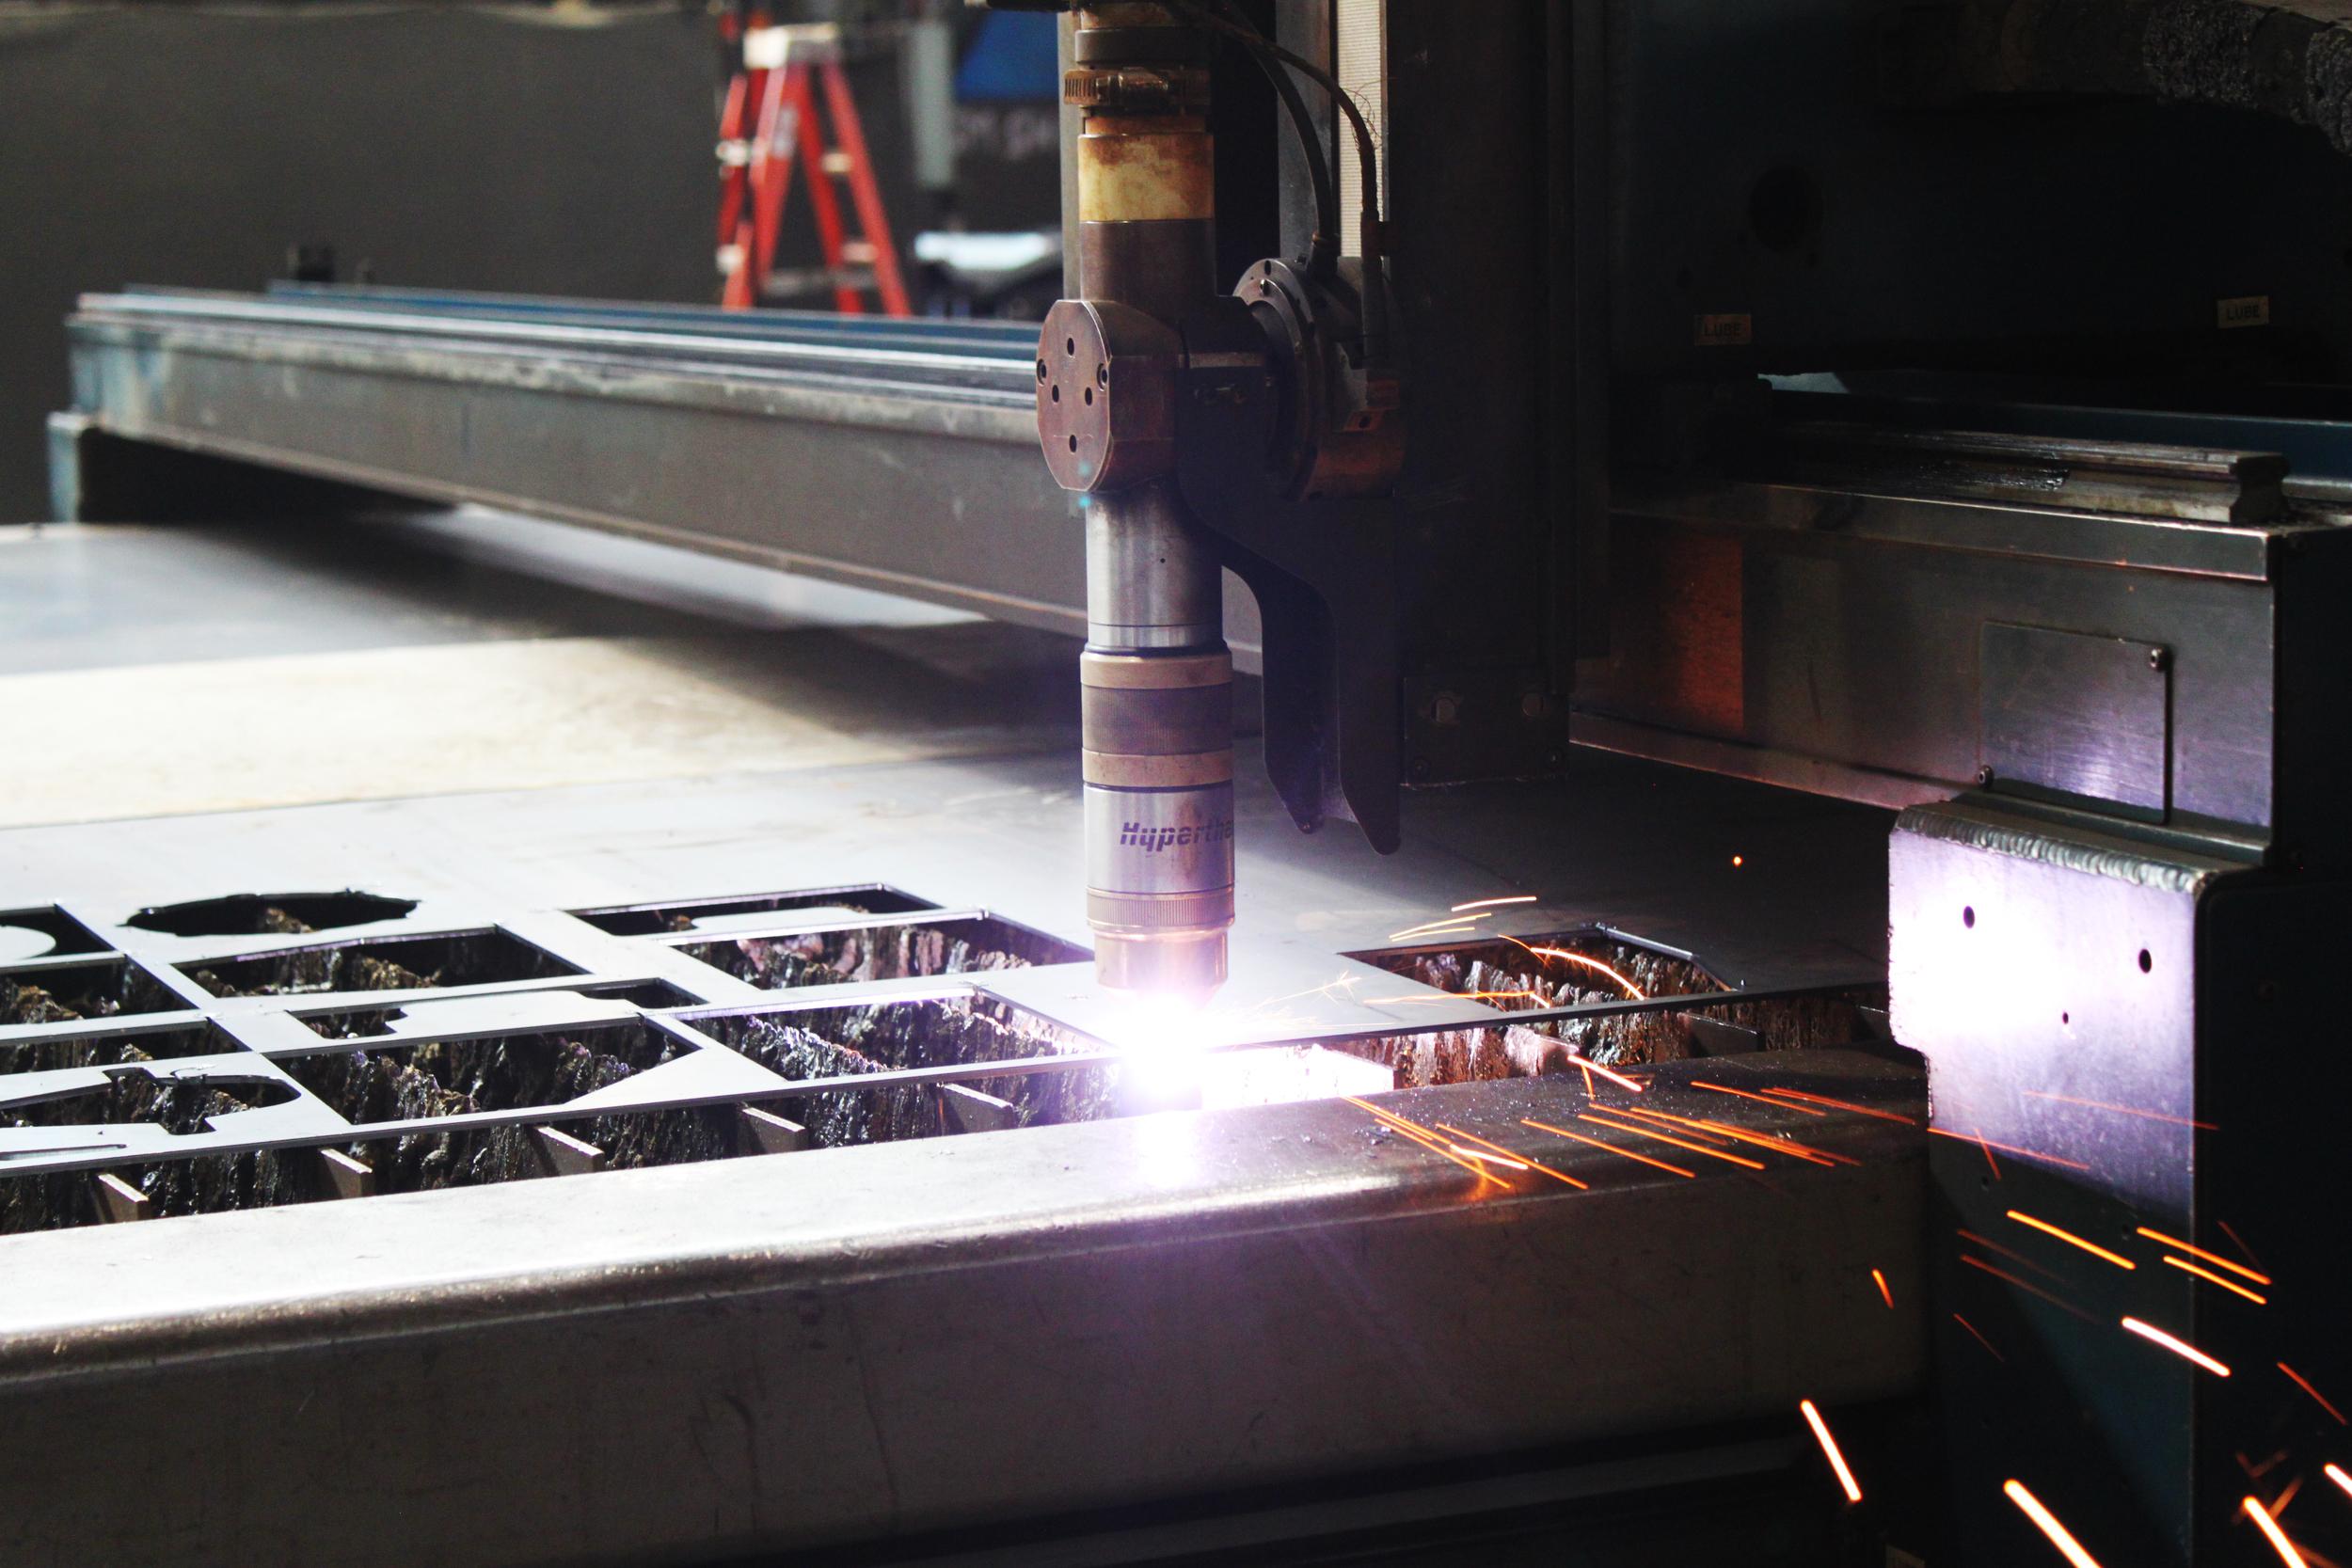 1. CNC Plasma Cut